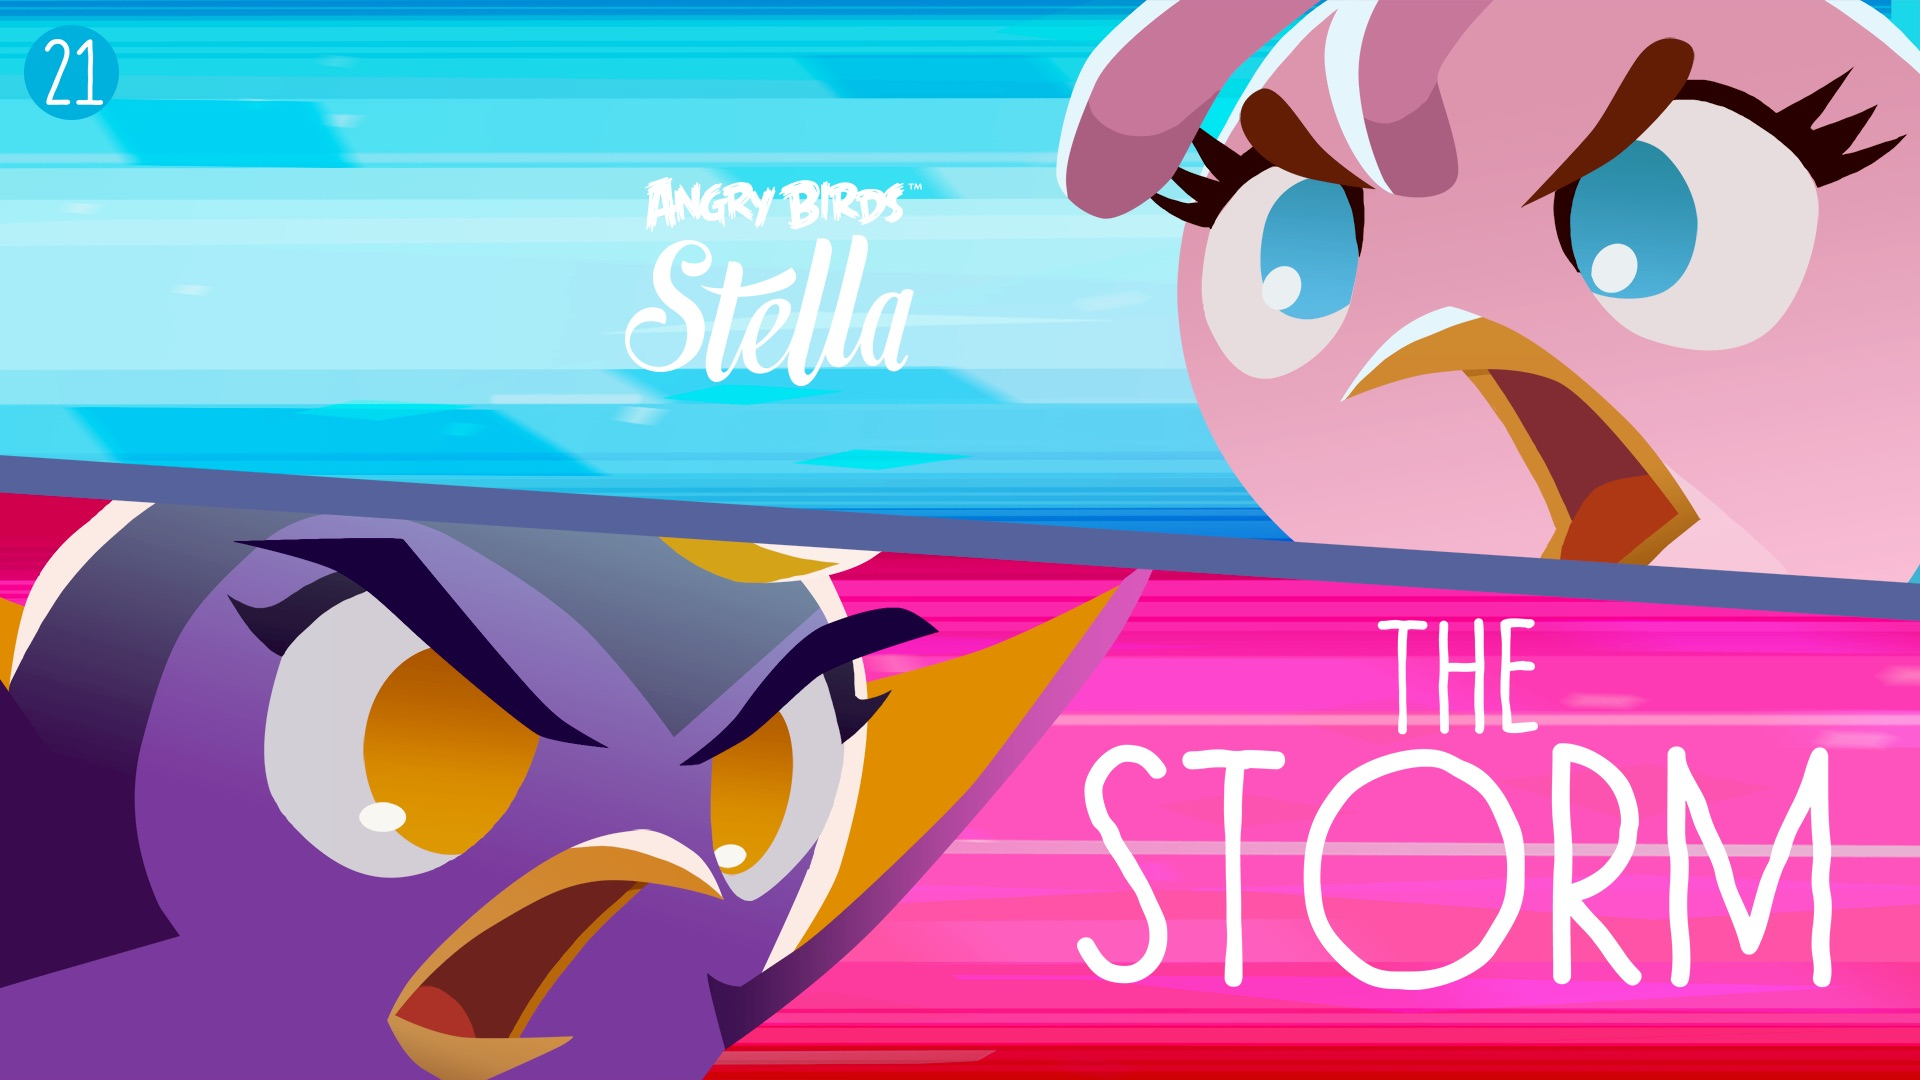 Angry Birds Stella (TV Series 2014– ) - Photo Gallery - IMDb